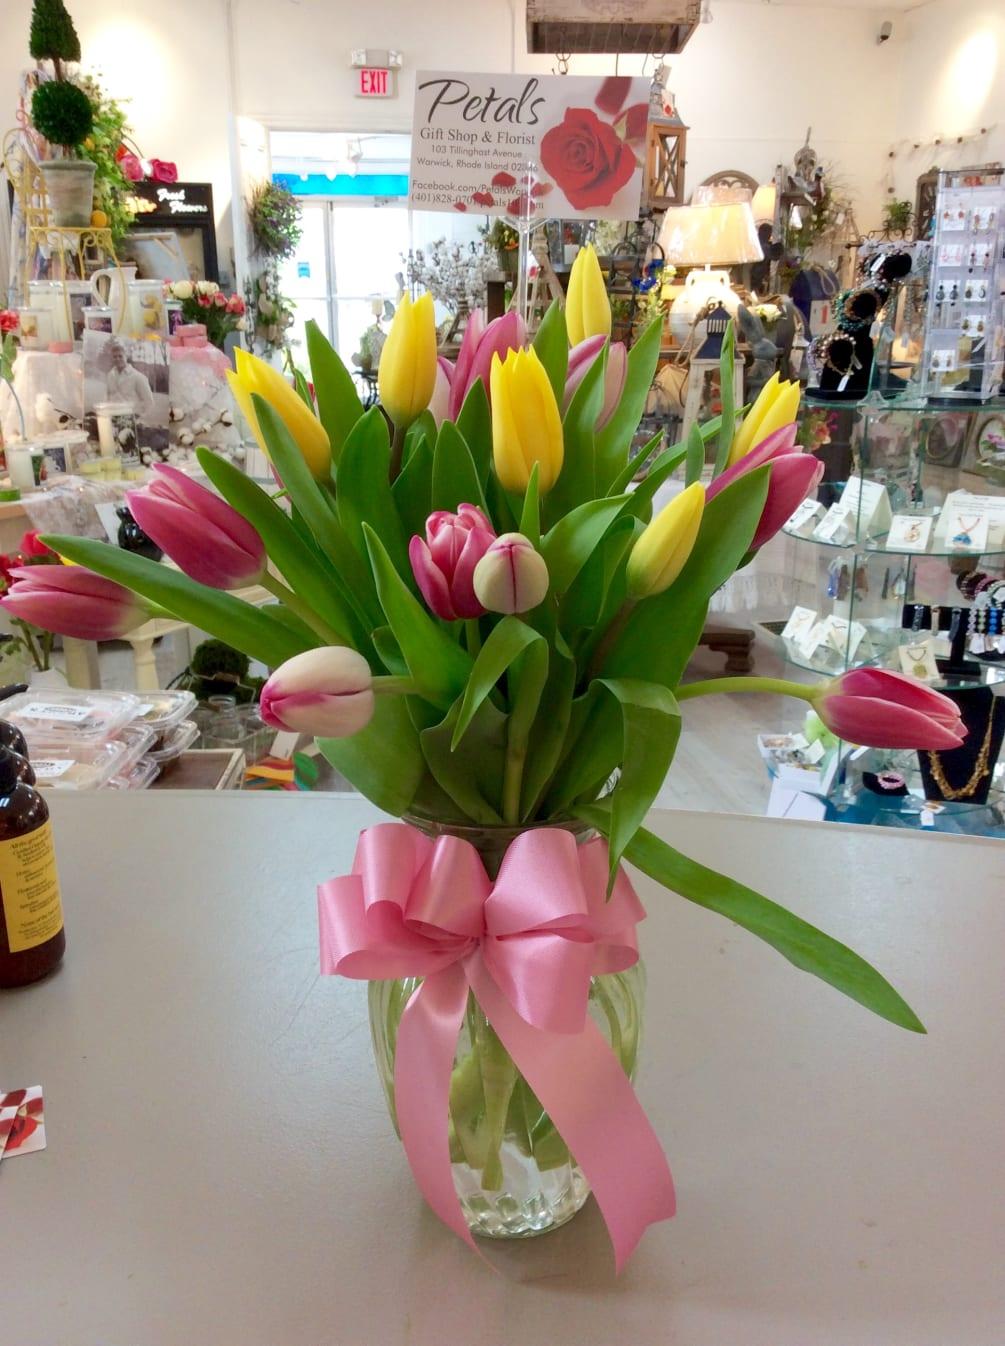 Bridal Pe Flowers Warwick Ri - Flowers Healthy